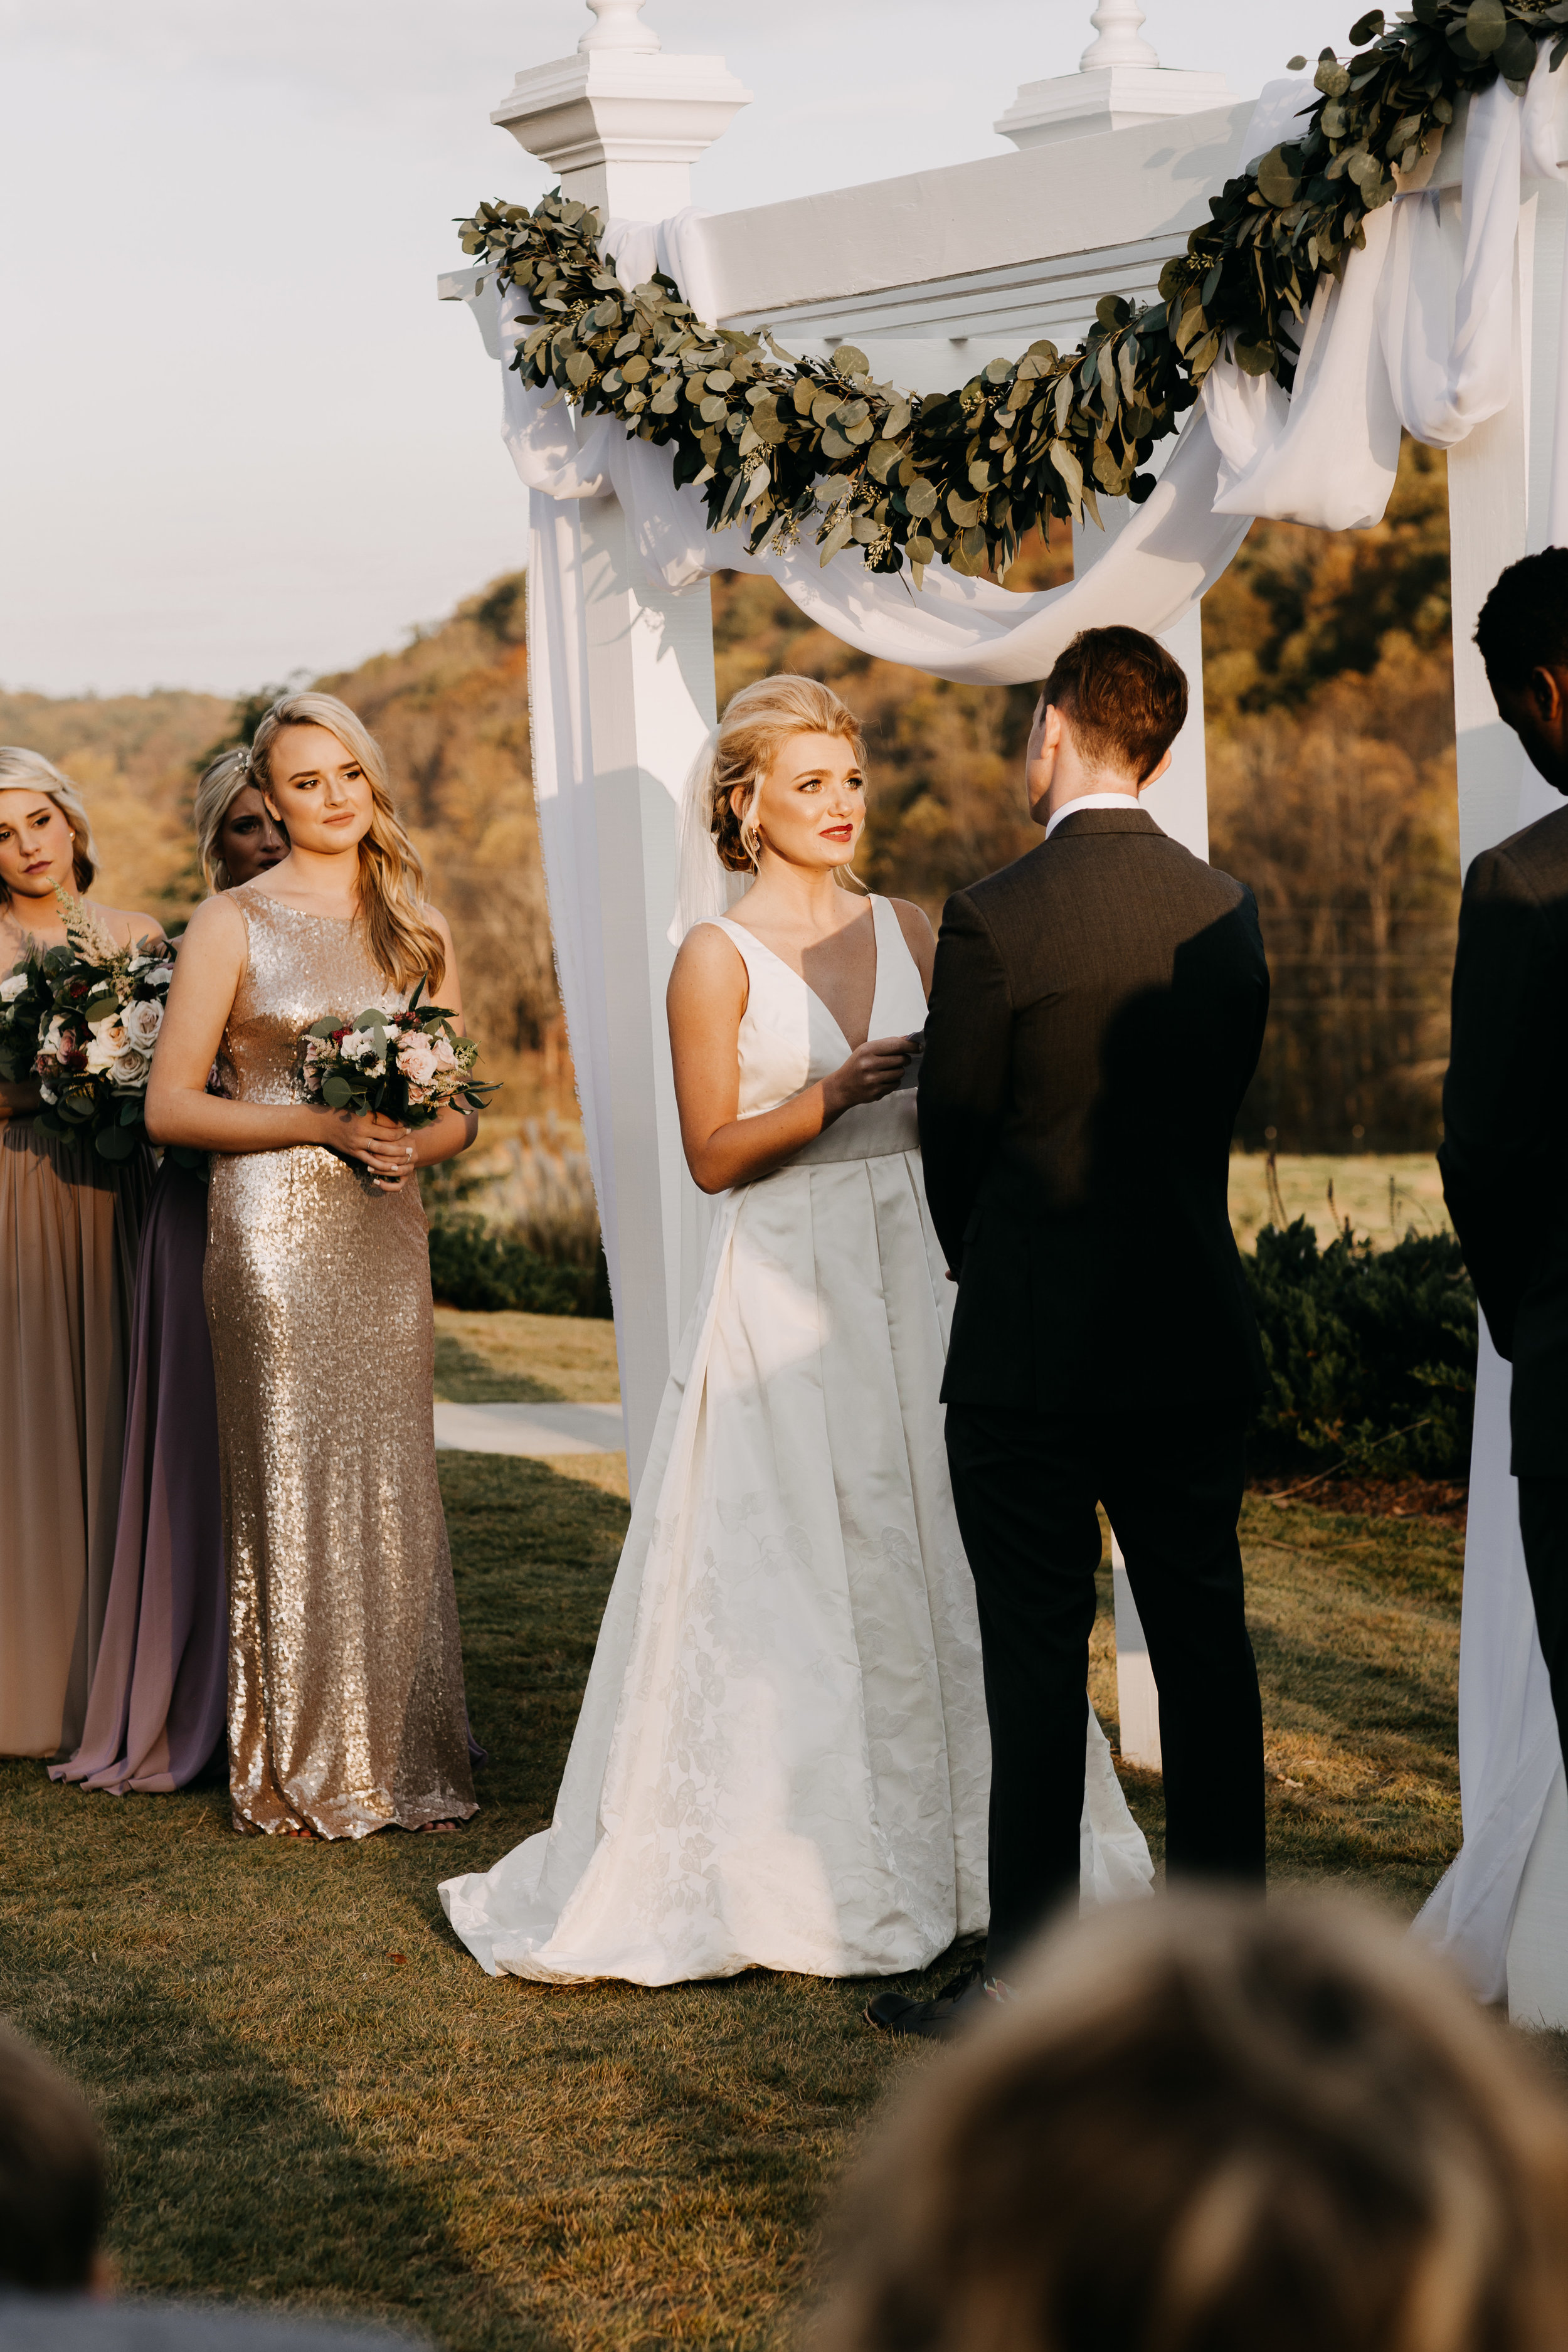 Kaylyn & Ryan Final Wedding Photos361.jpg